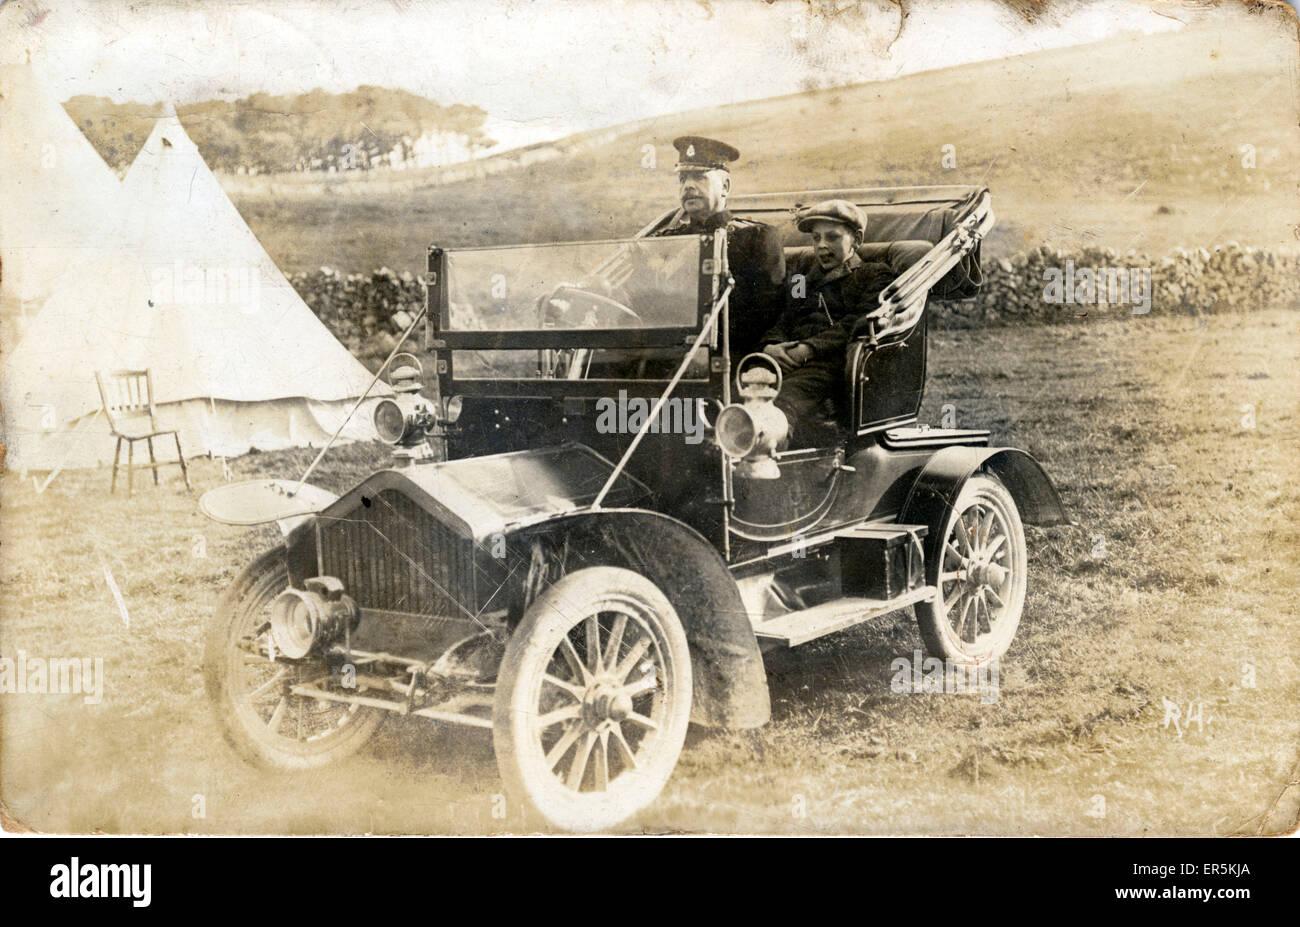 Humber Vintage Car (poss Veteran), Buxton, Derbyshire, England.  1910 - Stock Image